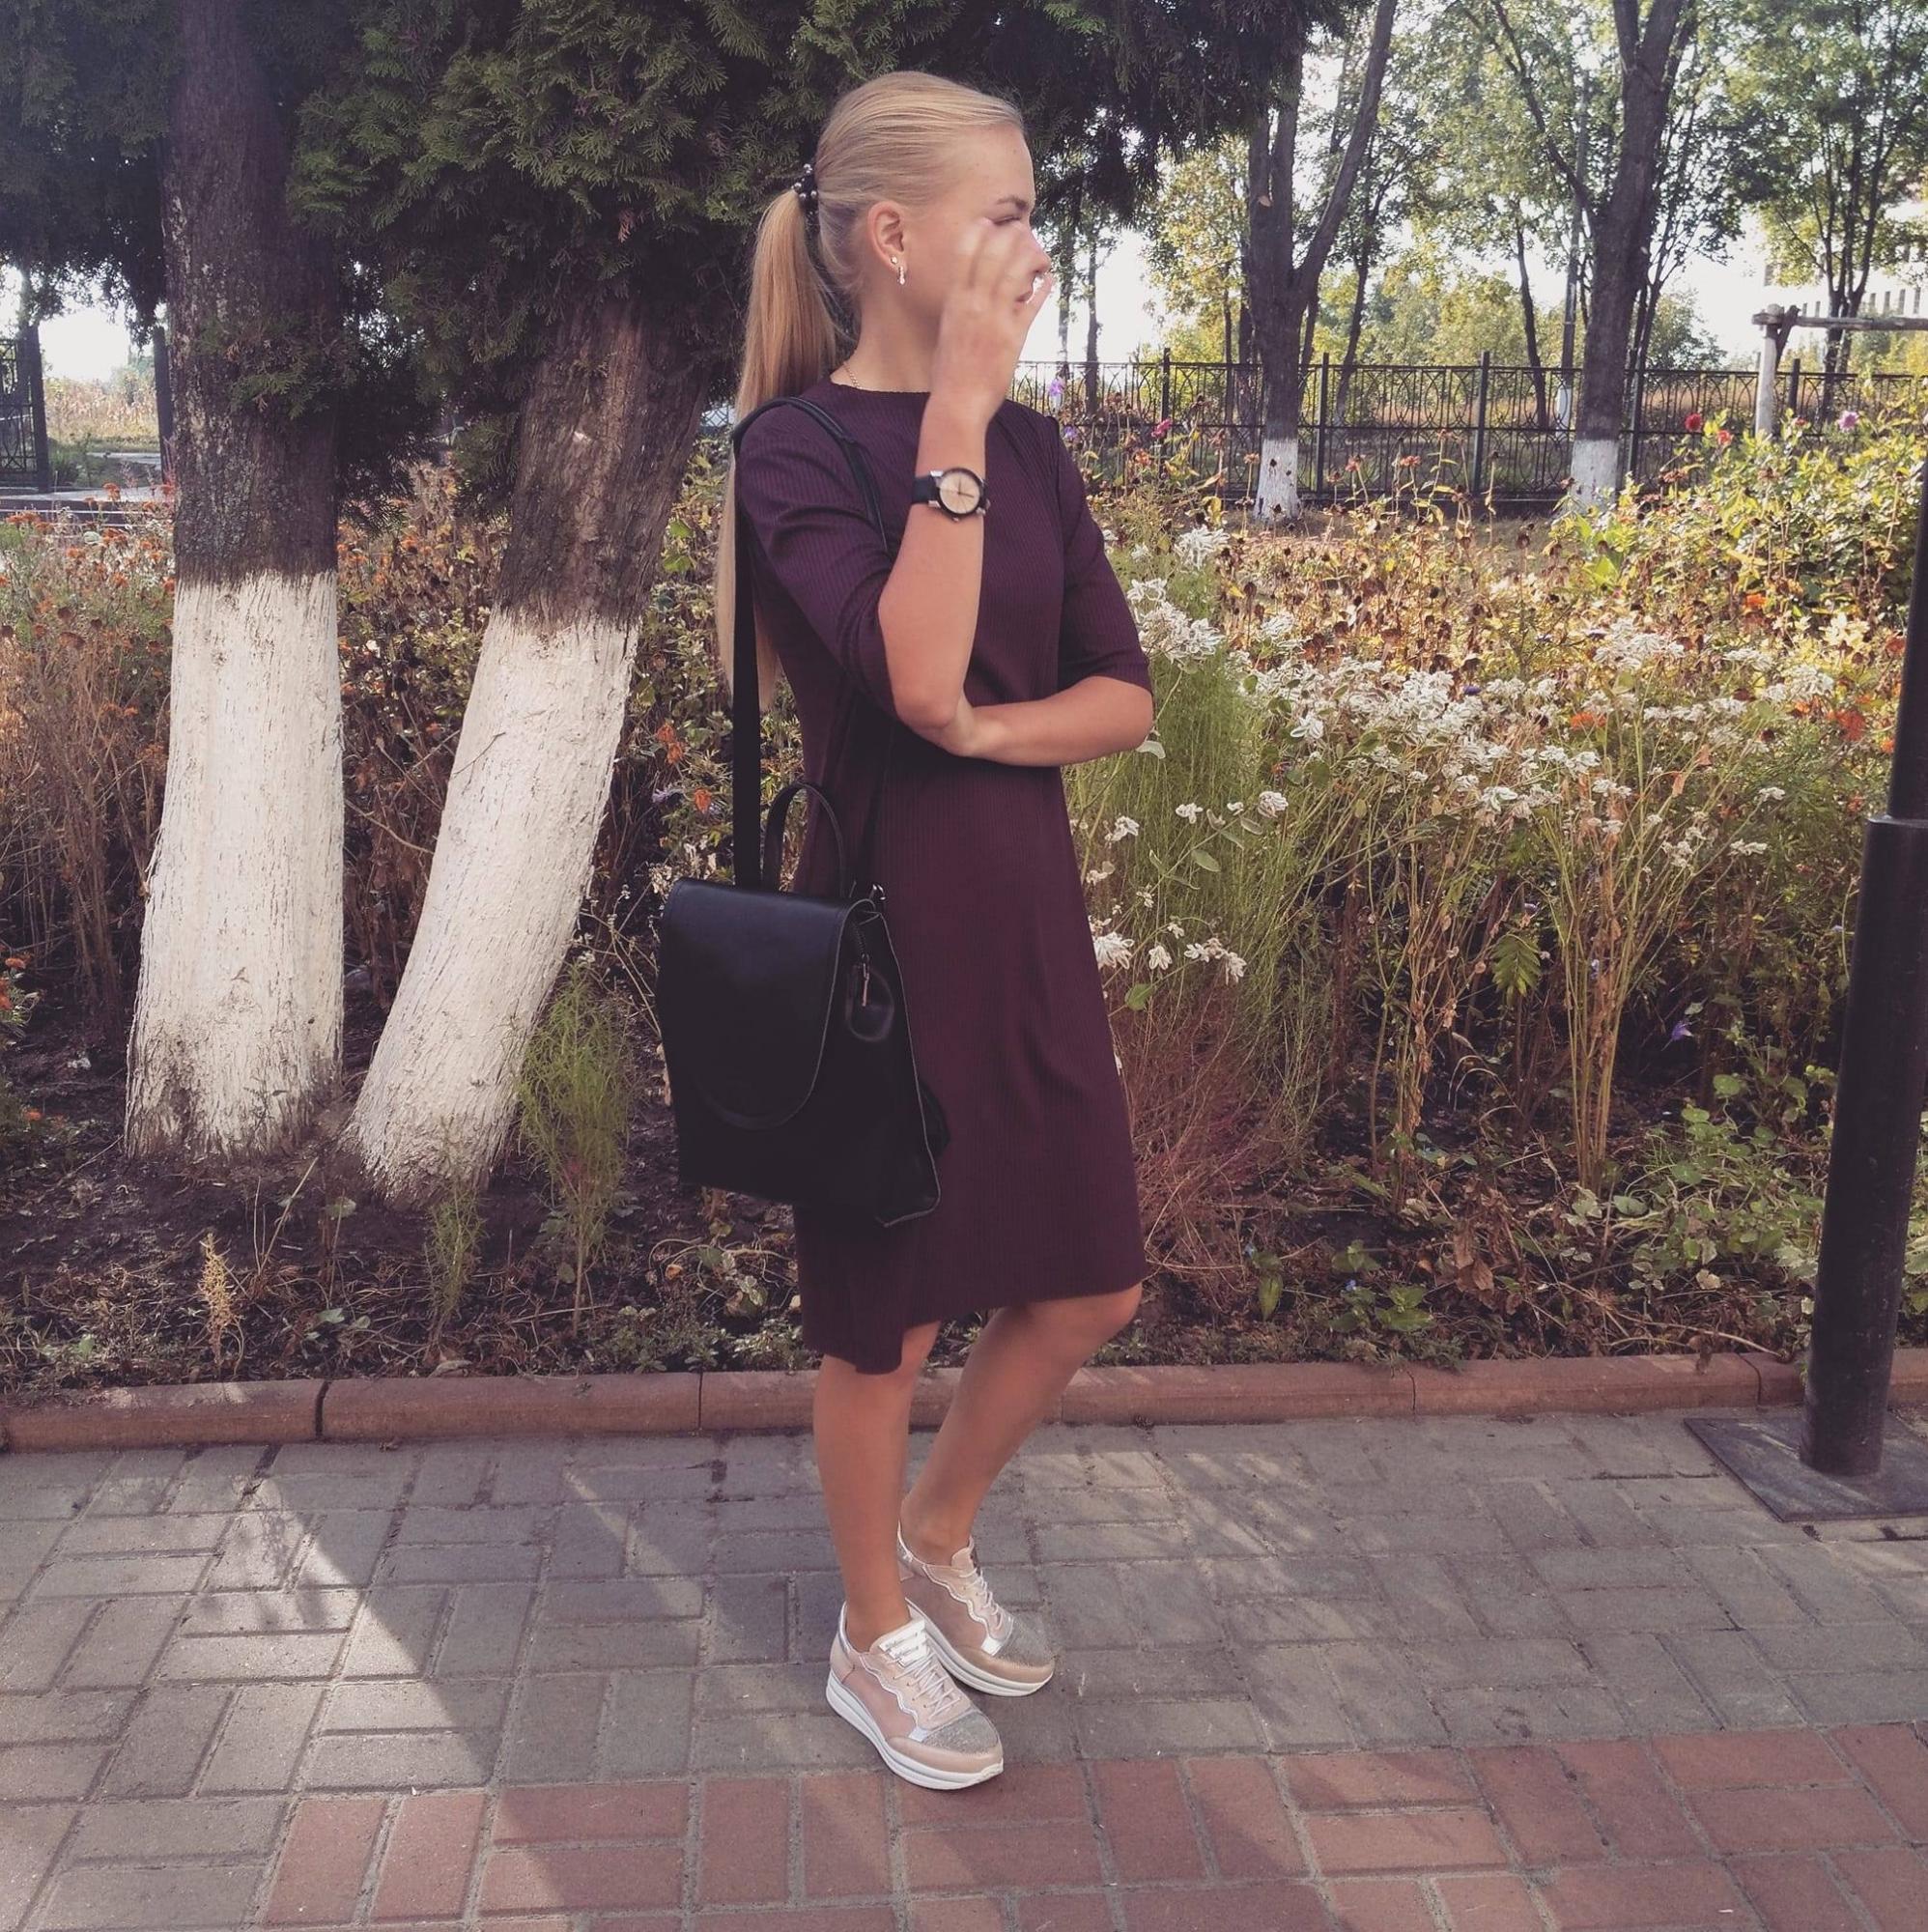 Украинская рекордсменка погибла в ДТП на трассе Киев-Прилуки